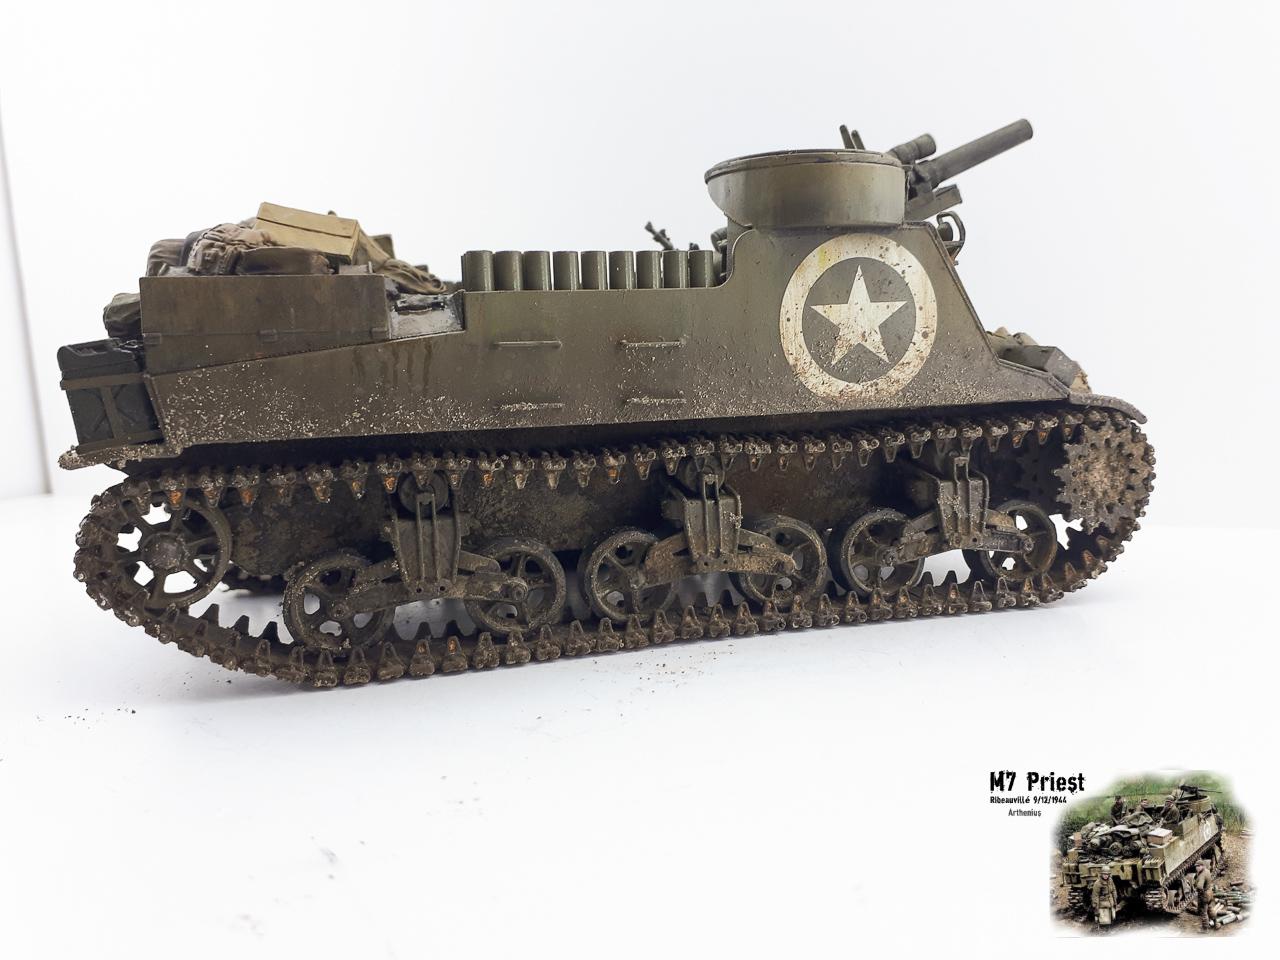 M7 Priest Ribeauvillé 9/12/1944 - Page 3 2018-110